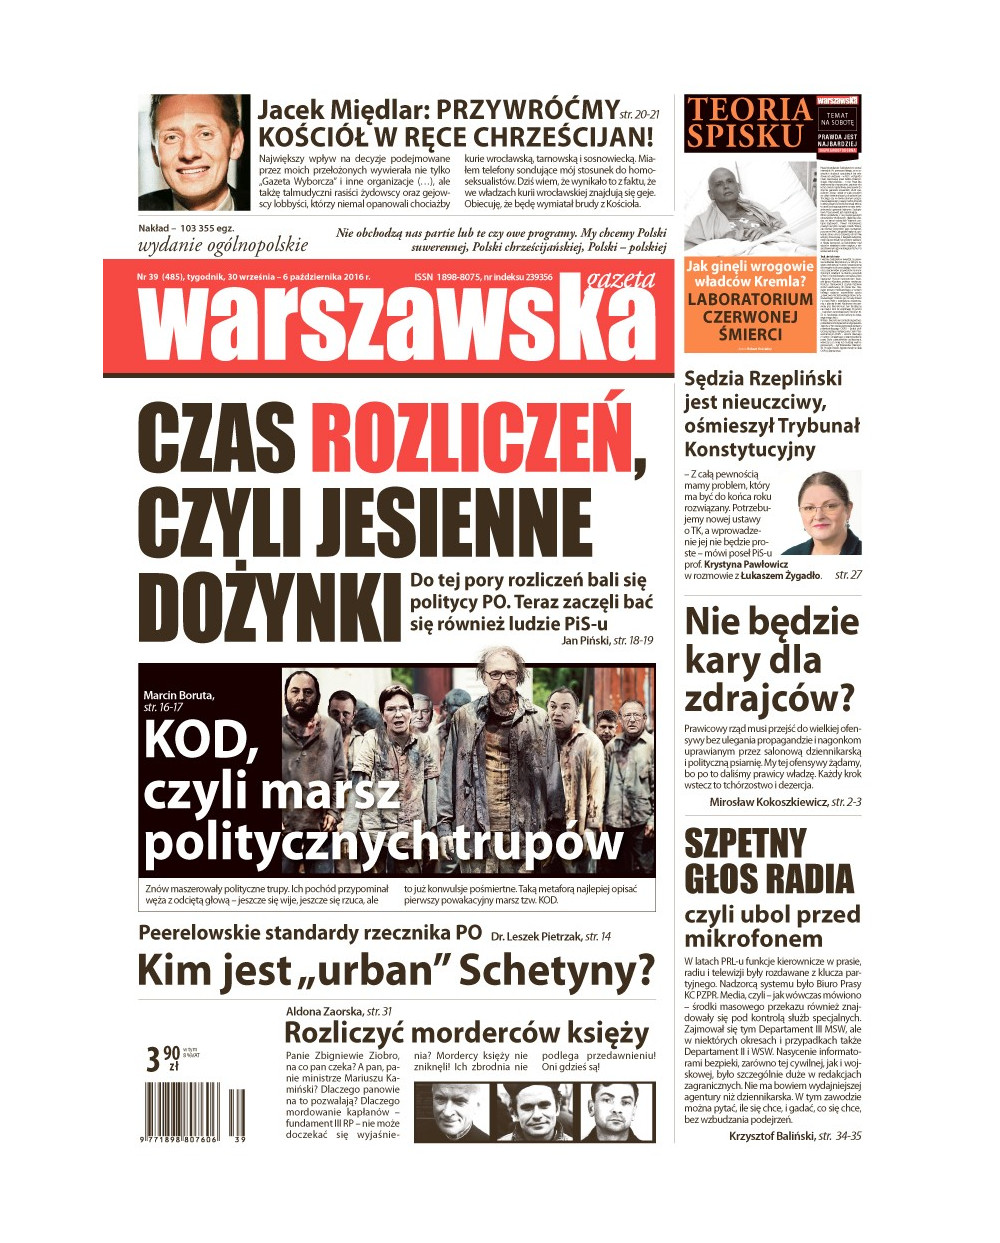 Warszawska Gazeta 39/2016